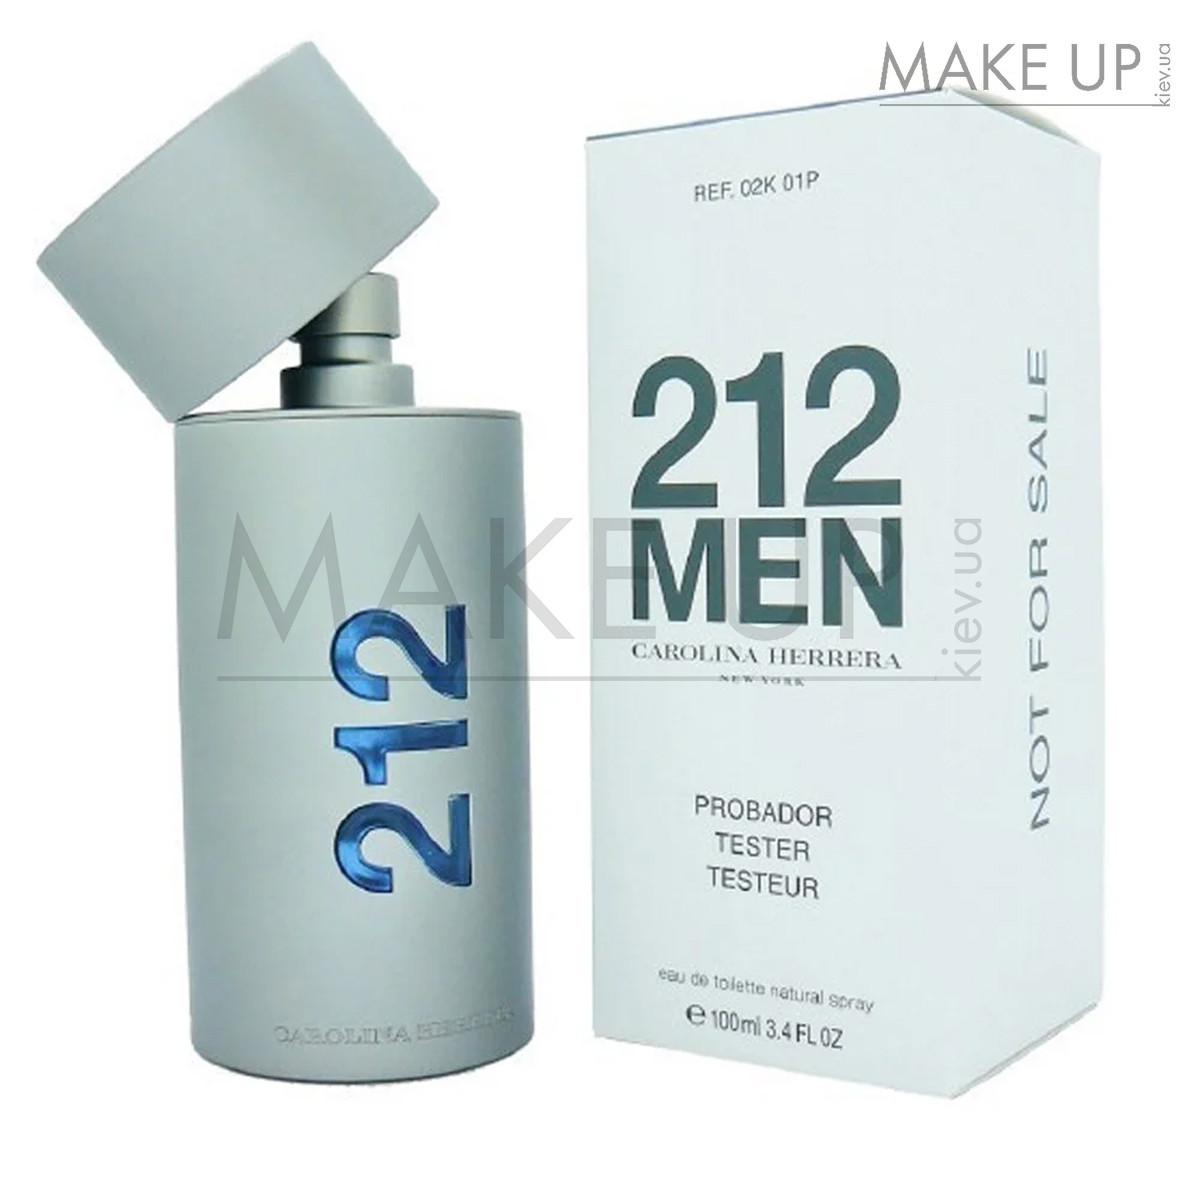 Tester мужская туалетная вода Carolina Herrera 212 Men EDT 100 мл. | Лиц. ОАЭ Тестер